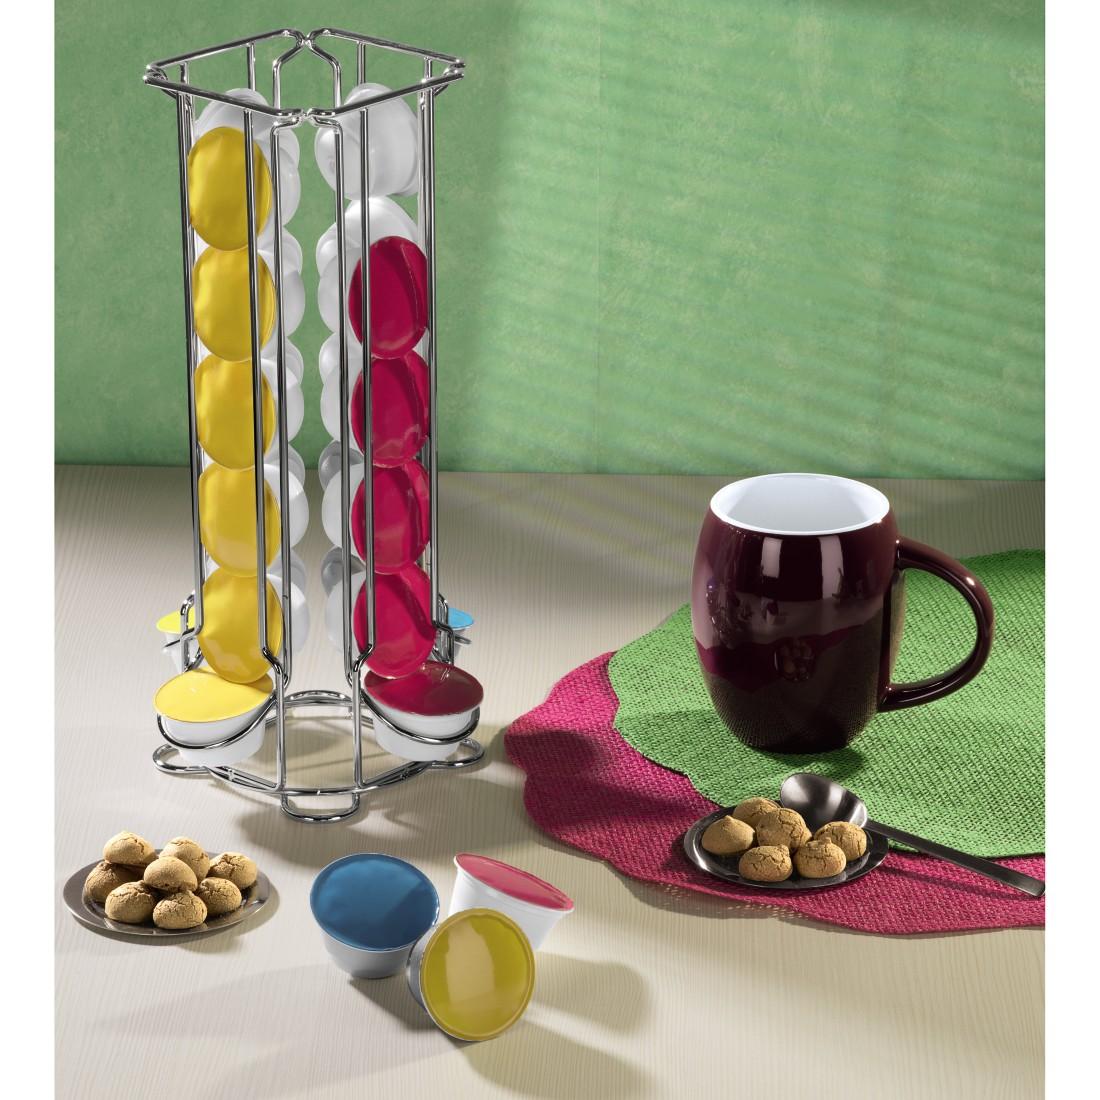 00111190 xavax kaffee kapselst nder colonna f r dolce. Black Bedroom Furniture Sets. Home Design Ideas